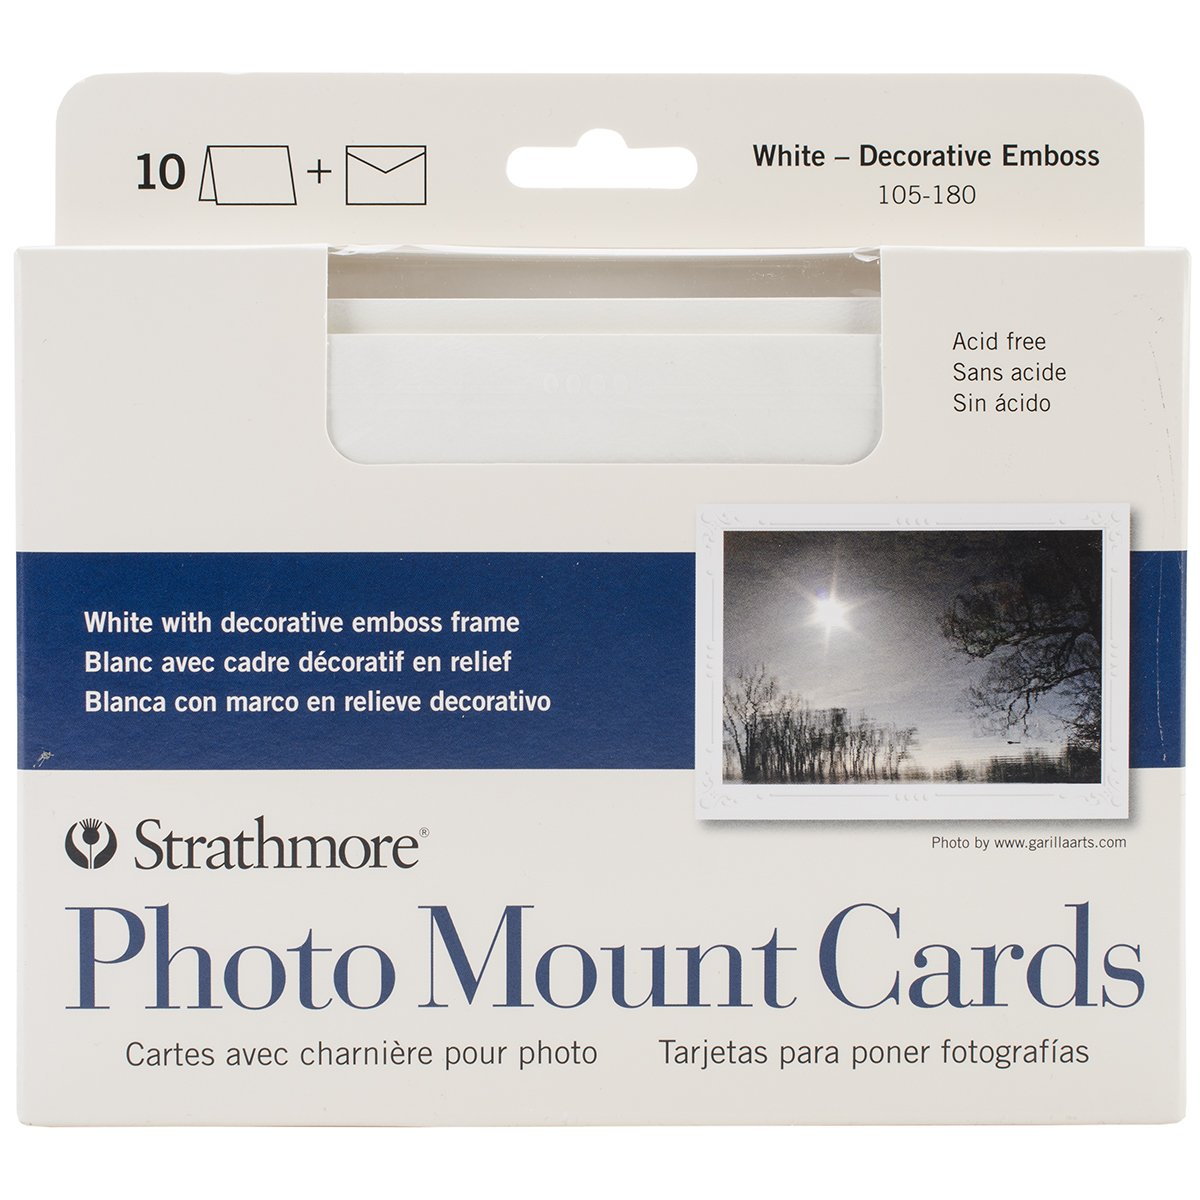 Strathmore Cards & Envelopes 13cm x 17cm 10/Pkg B0025U0QSO